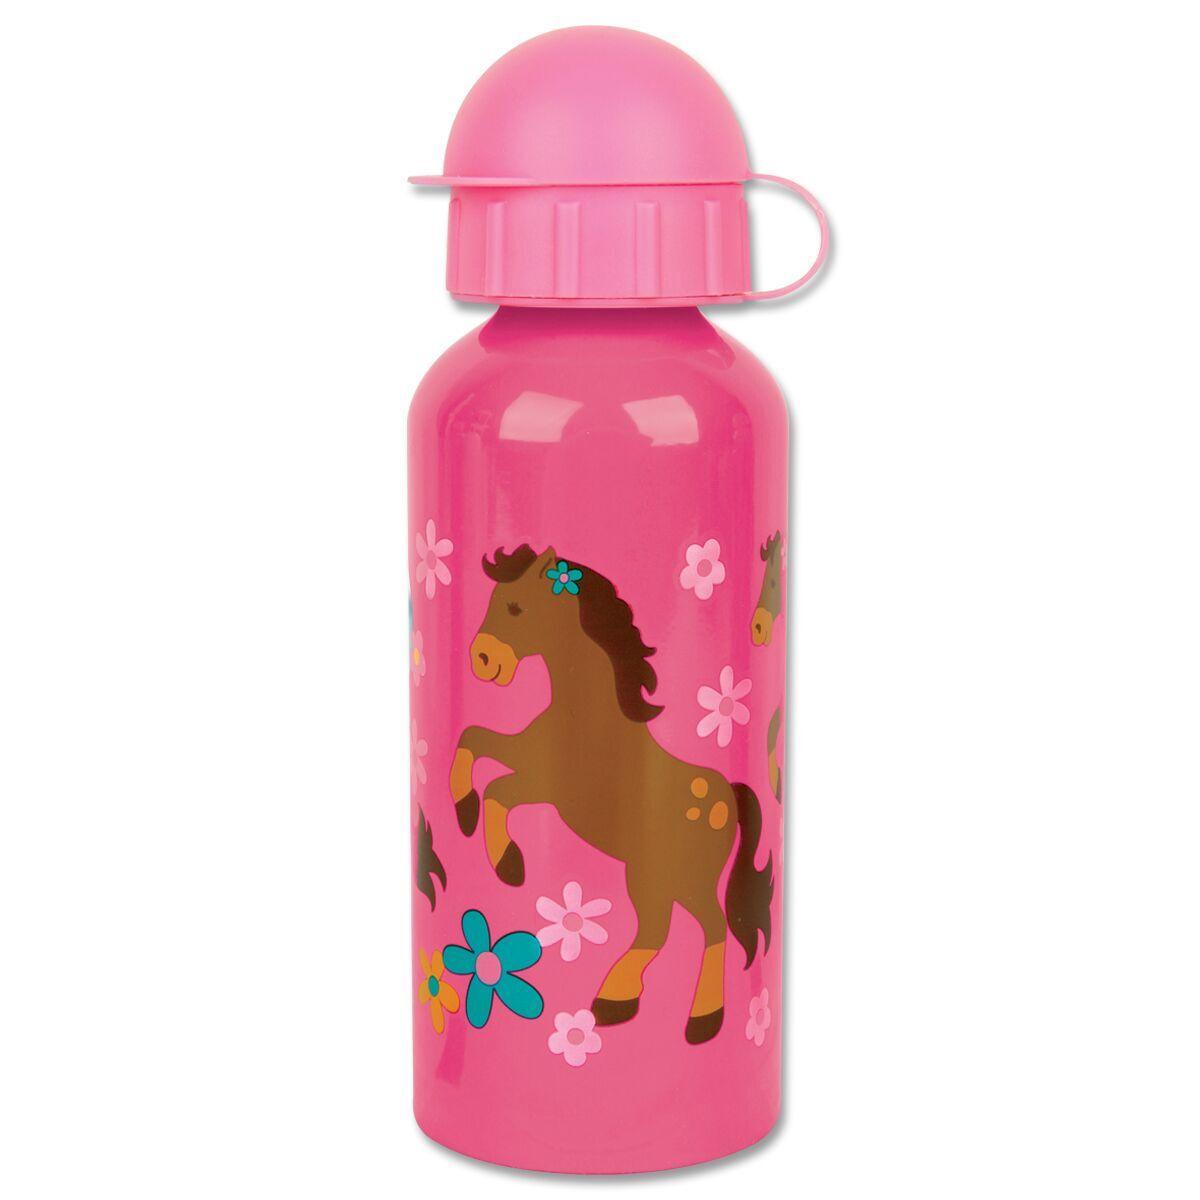 Stephen Joseph Horse Girl Drink Bottle Filly And Co